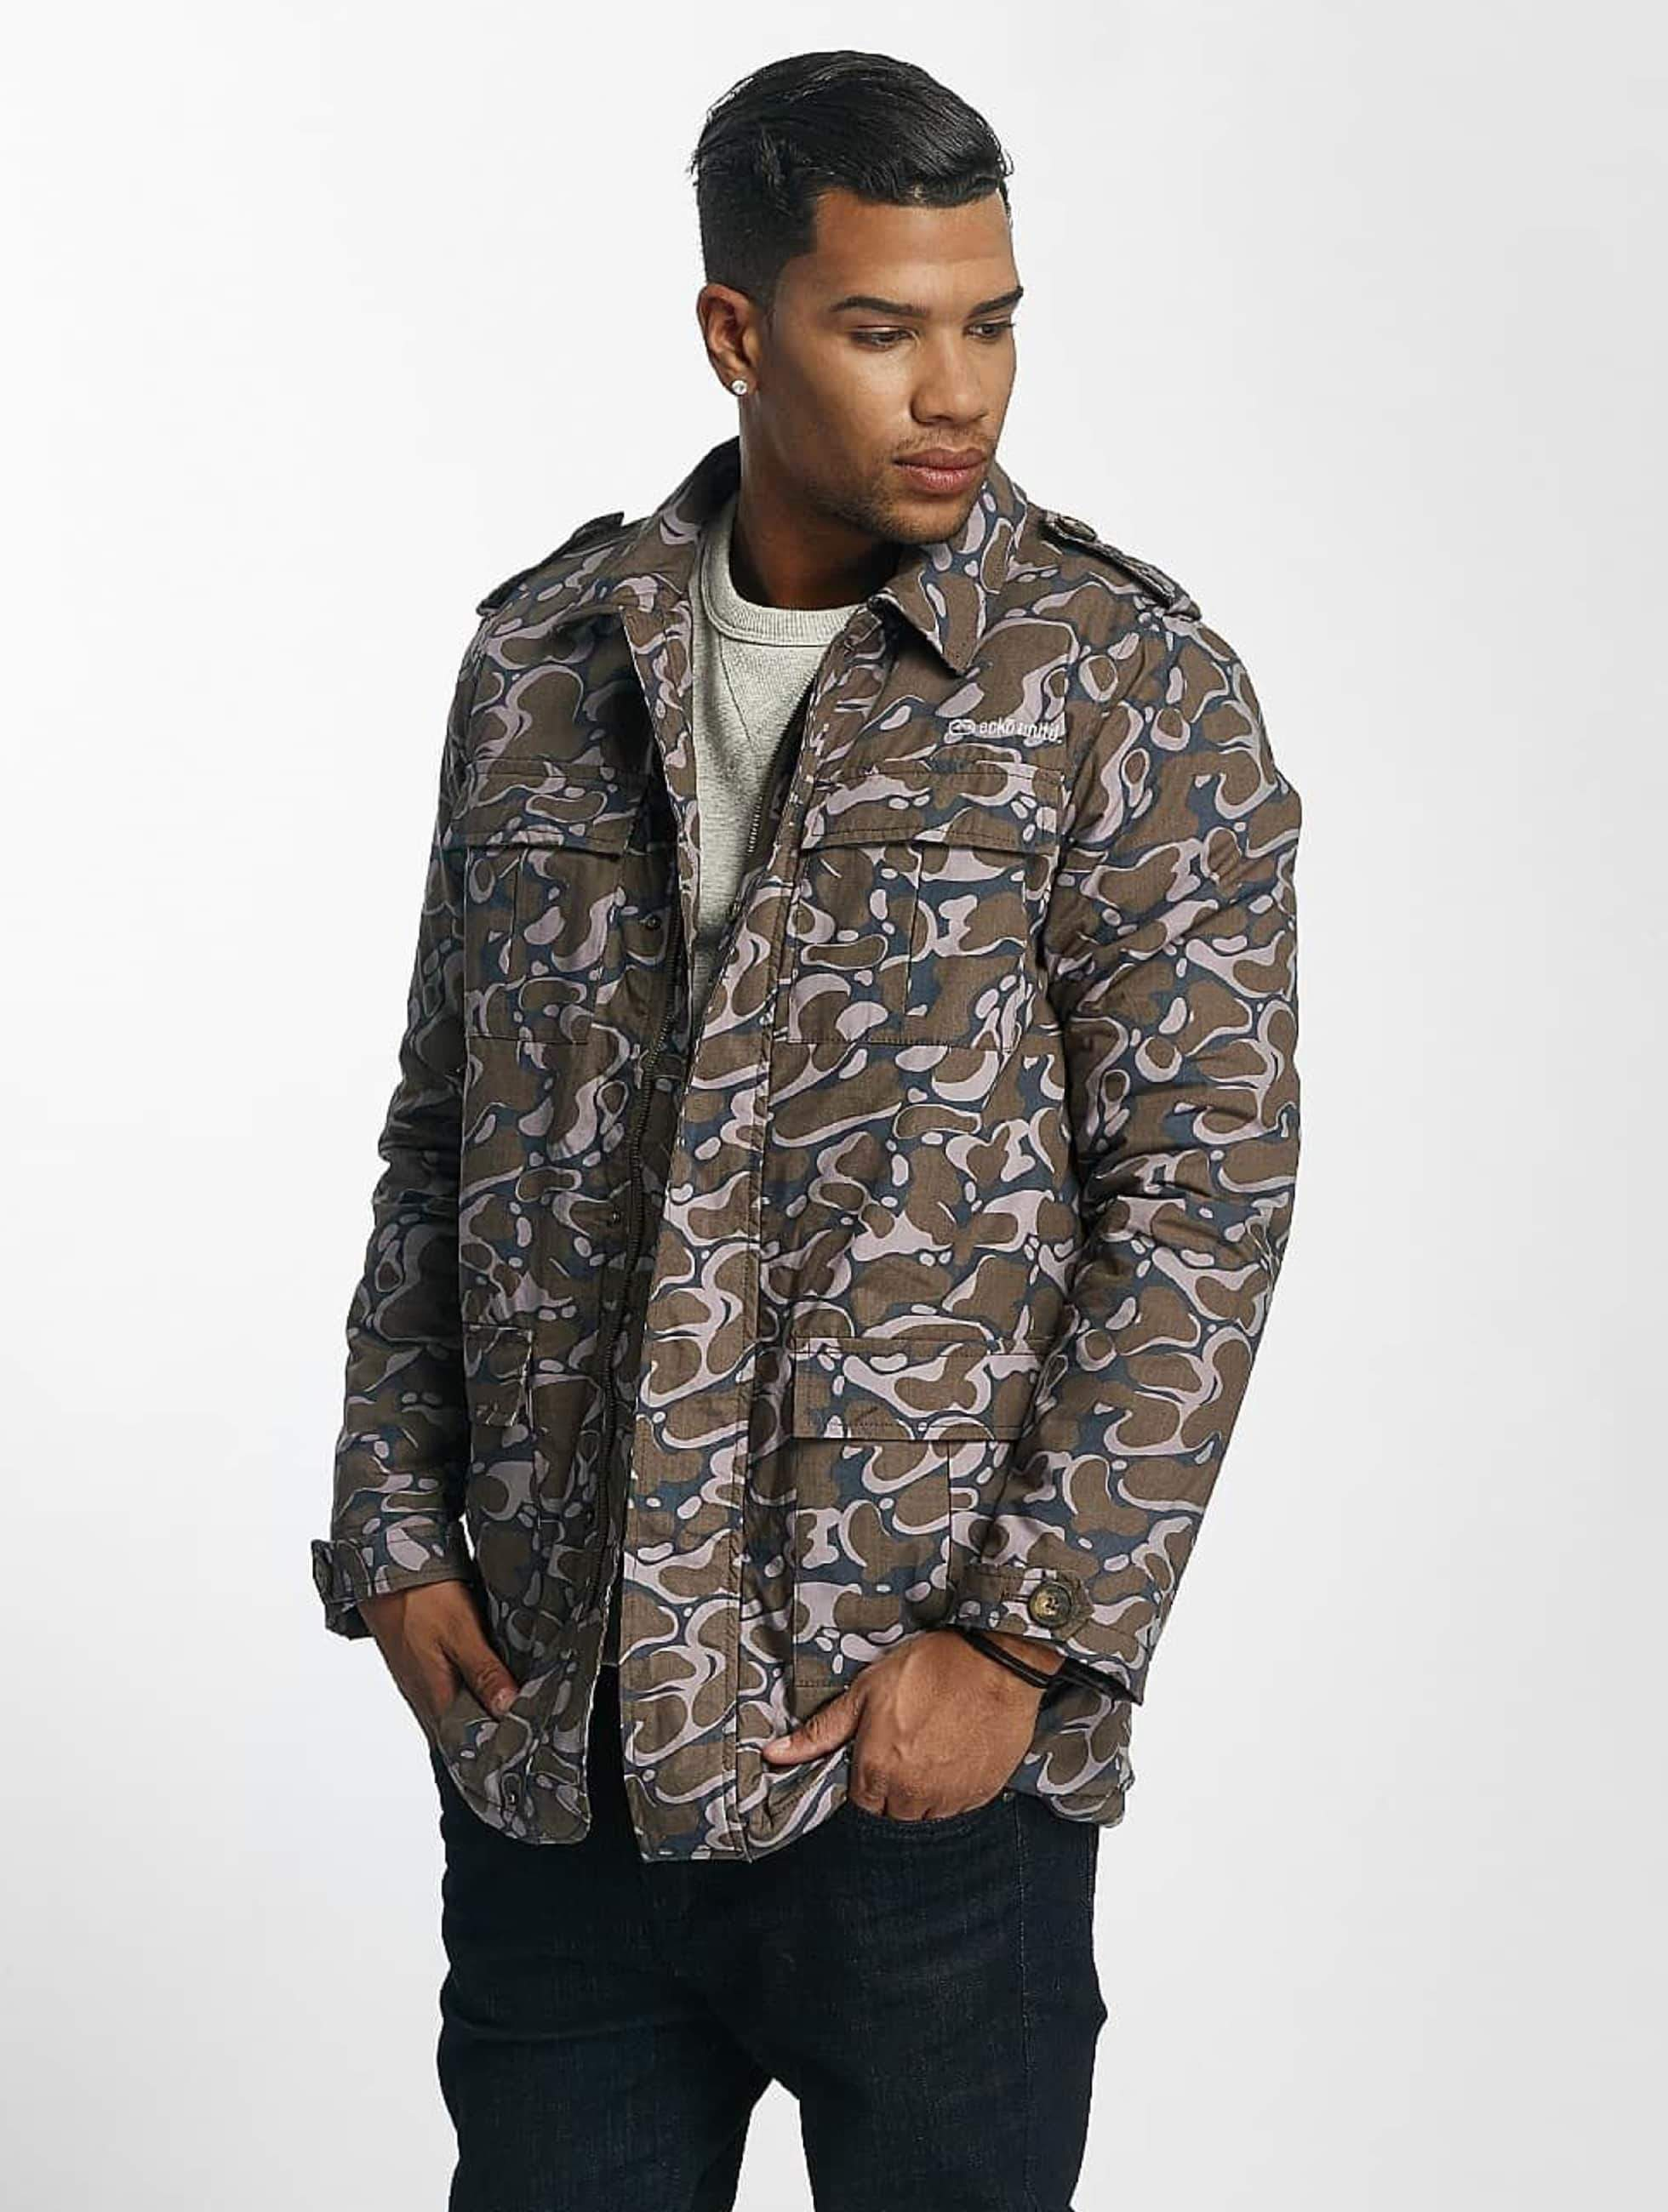 Ecko Unltd. / Lightweight Jacket Corporal in camouflage 2XL